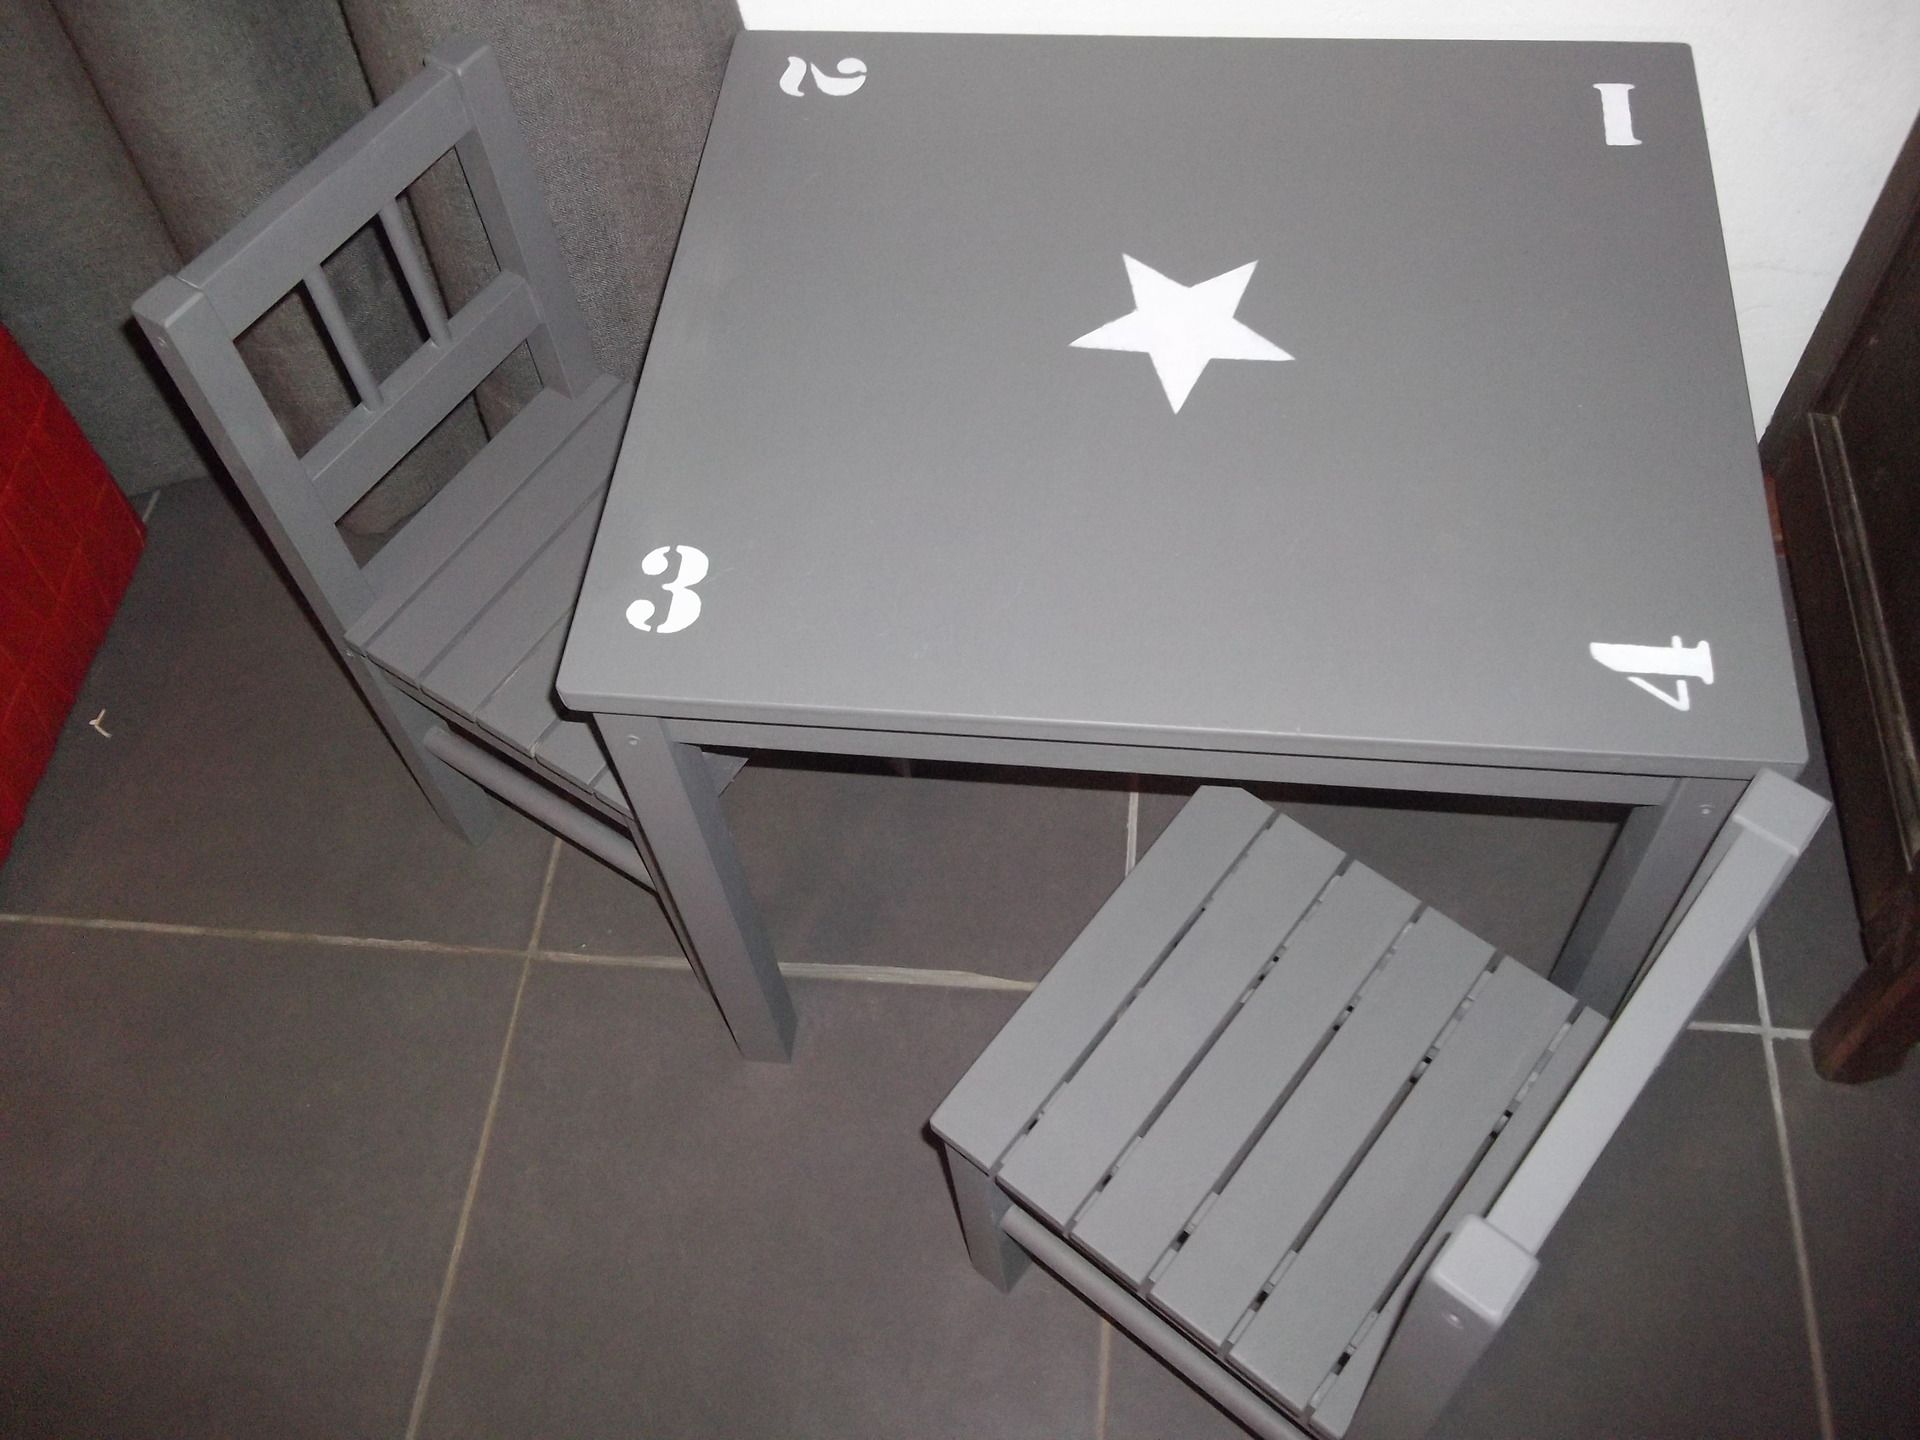 452d514a3eae44fcd36bb21926cdc78b Impressionnant De Ensemble Table Chaise Concept